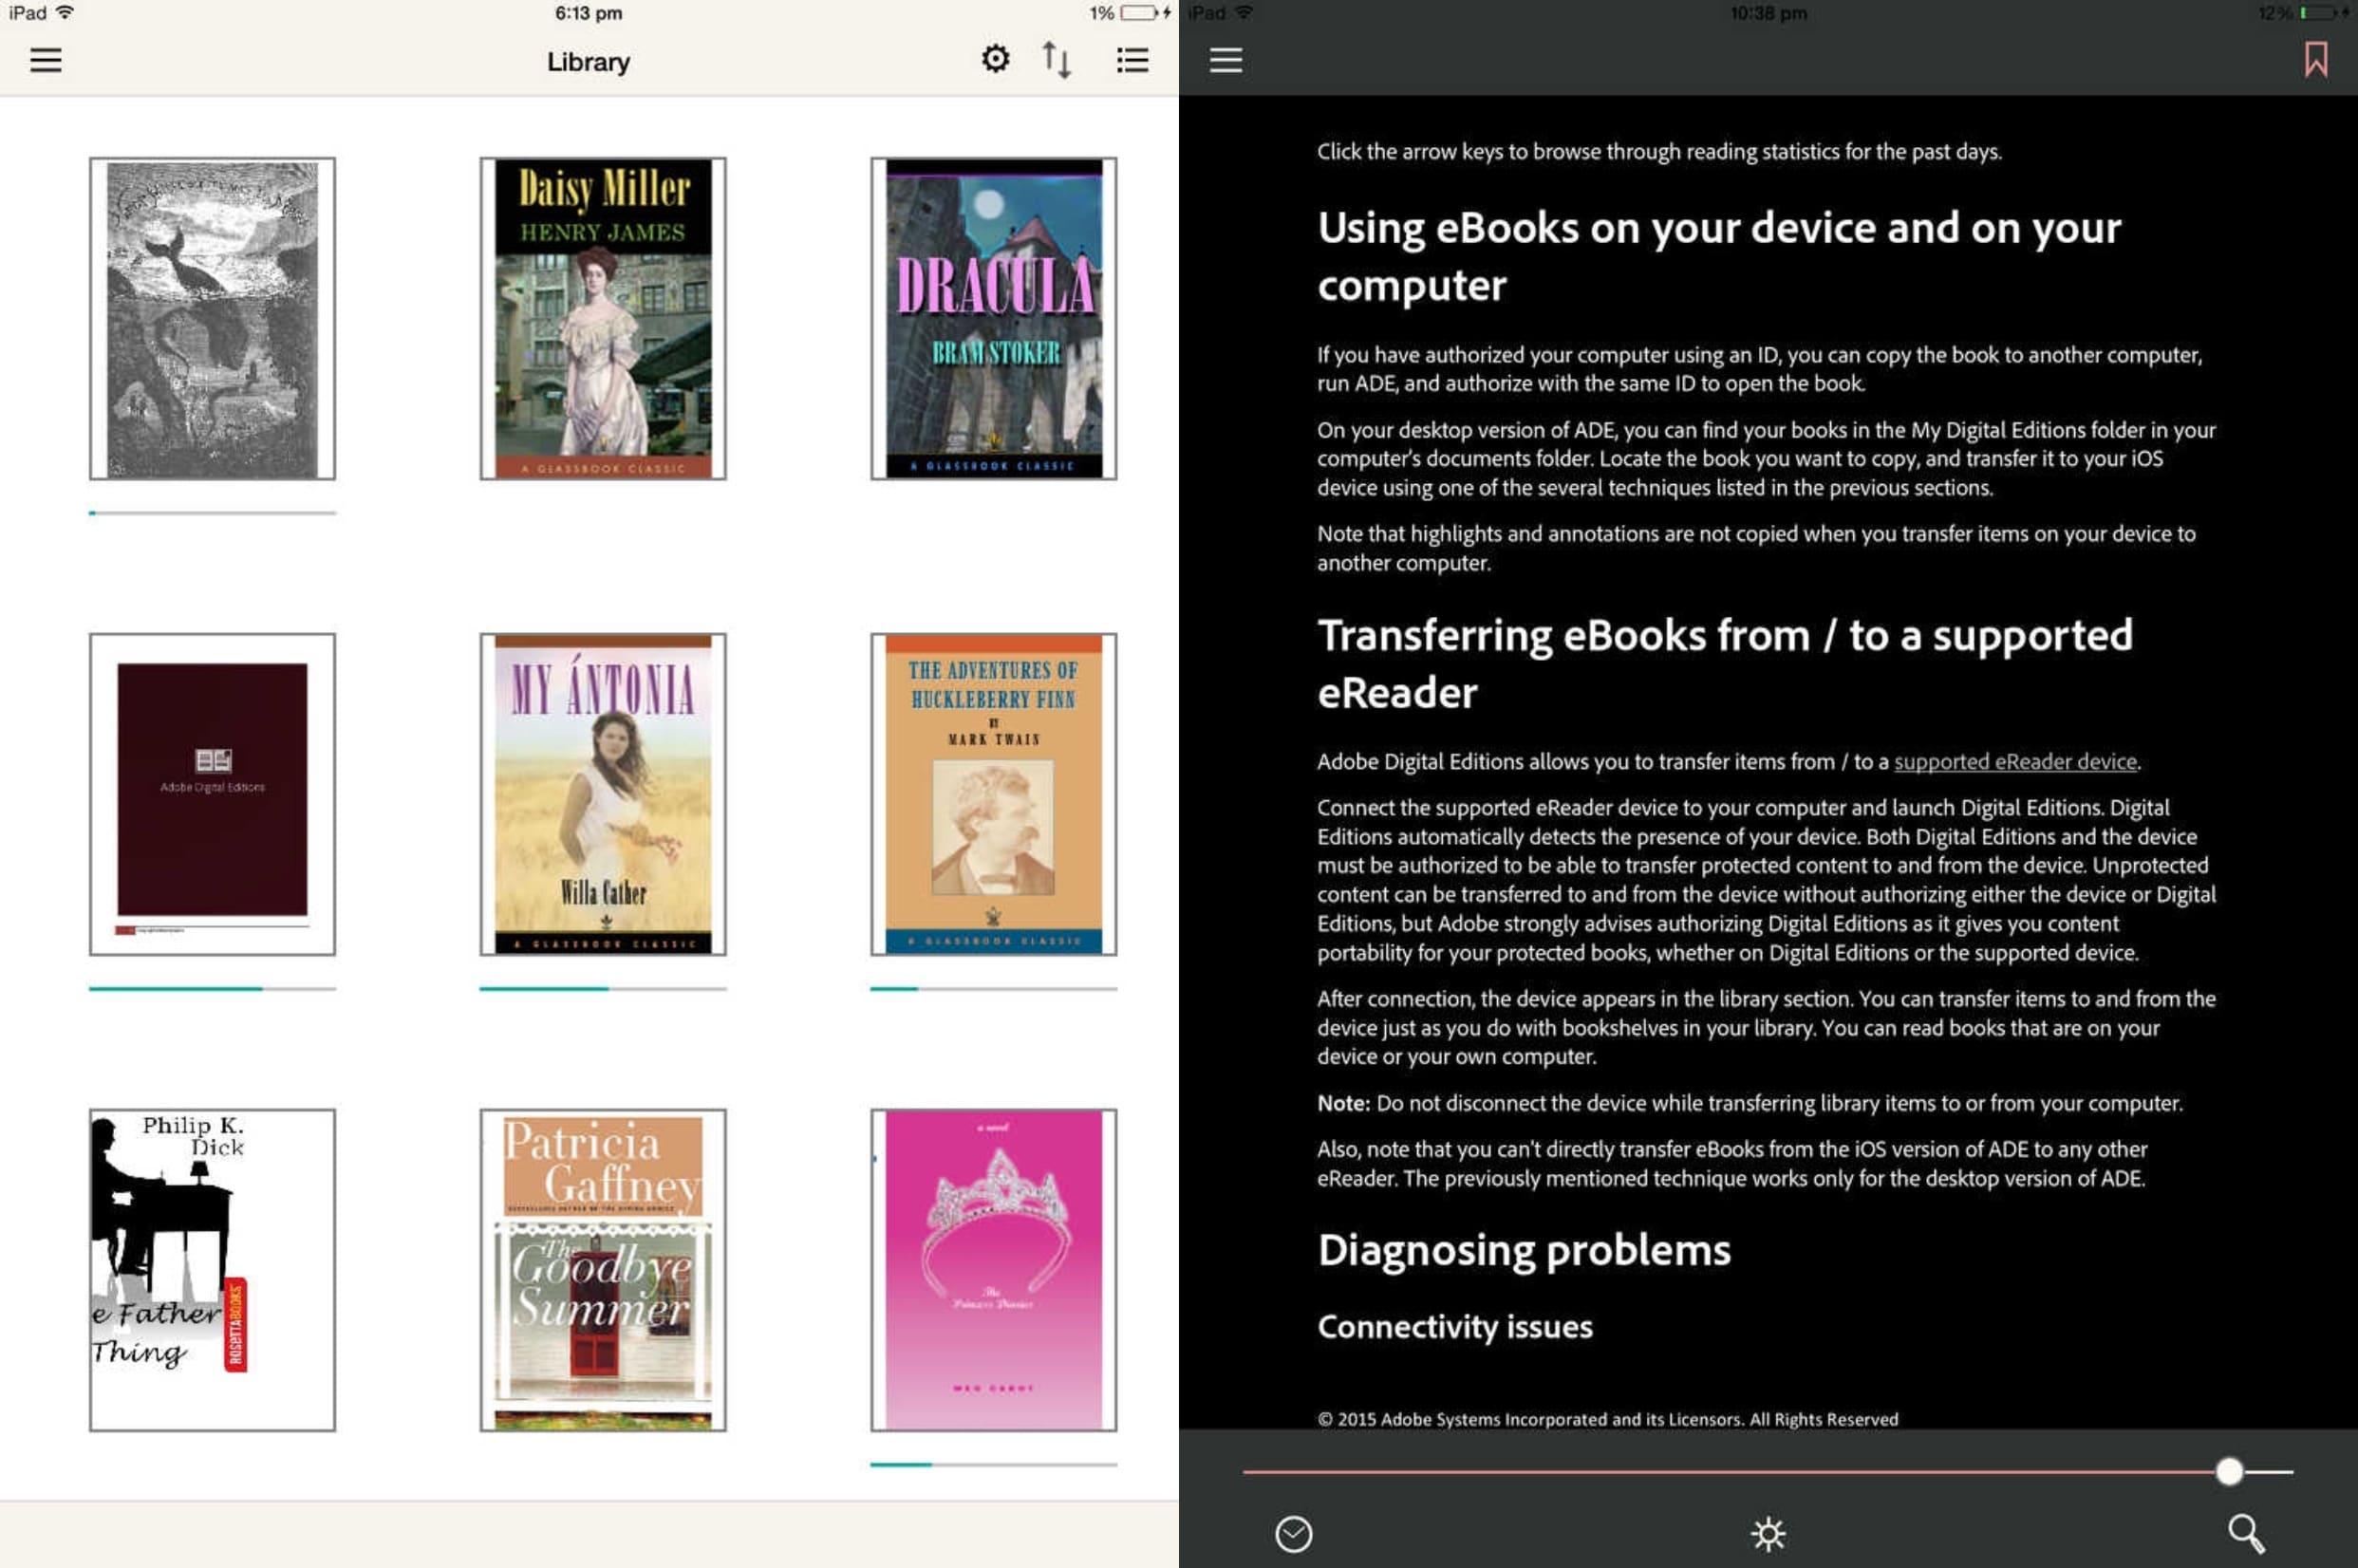 iPad 2 problem - Adobe Support Community -